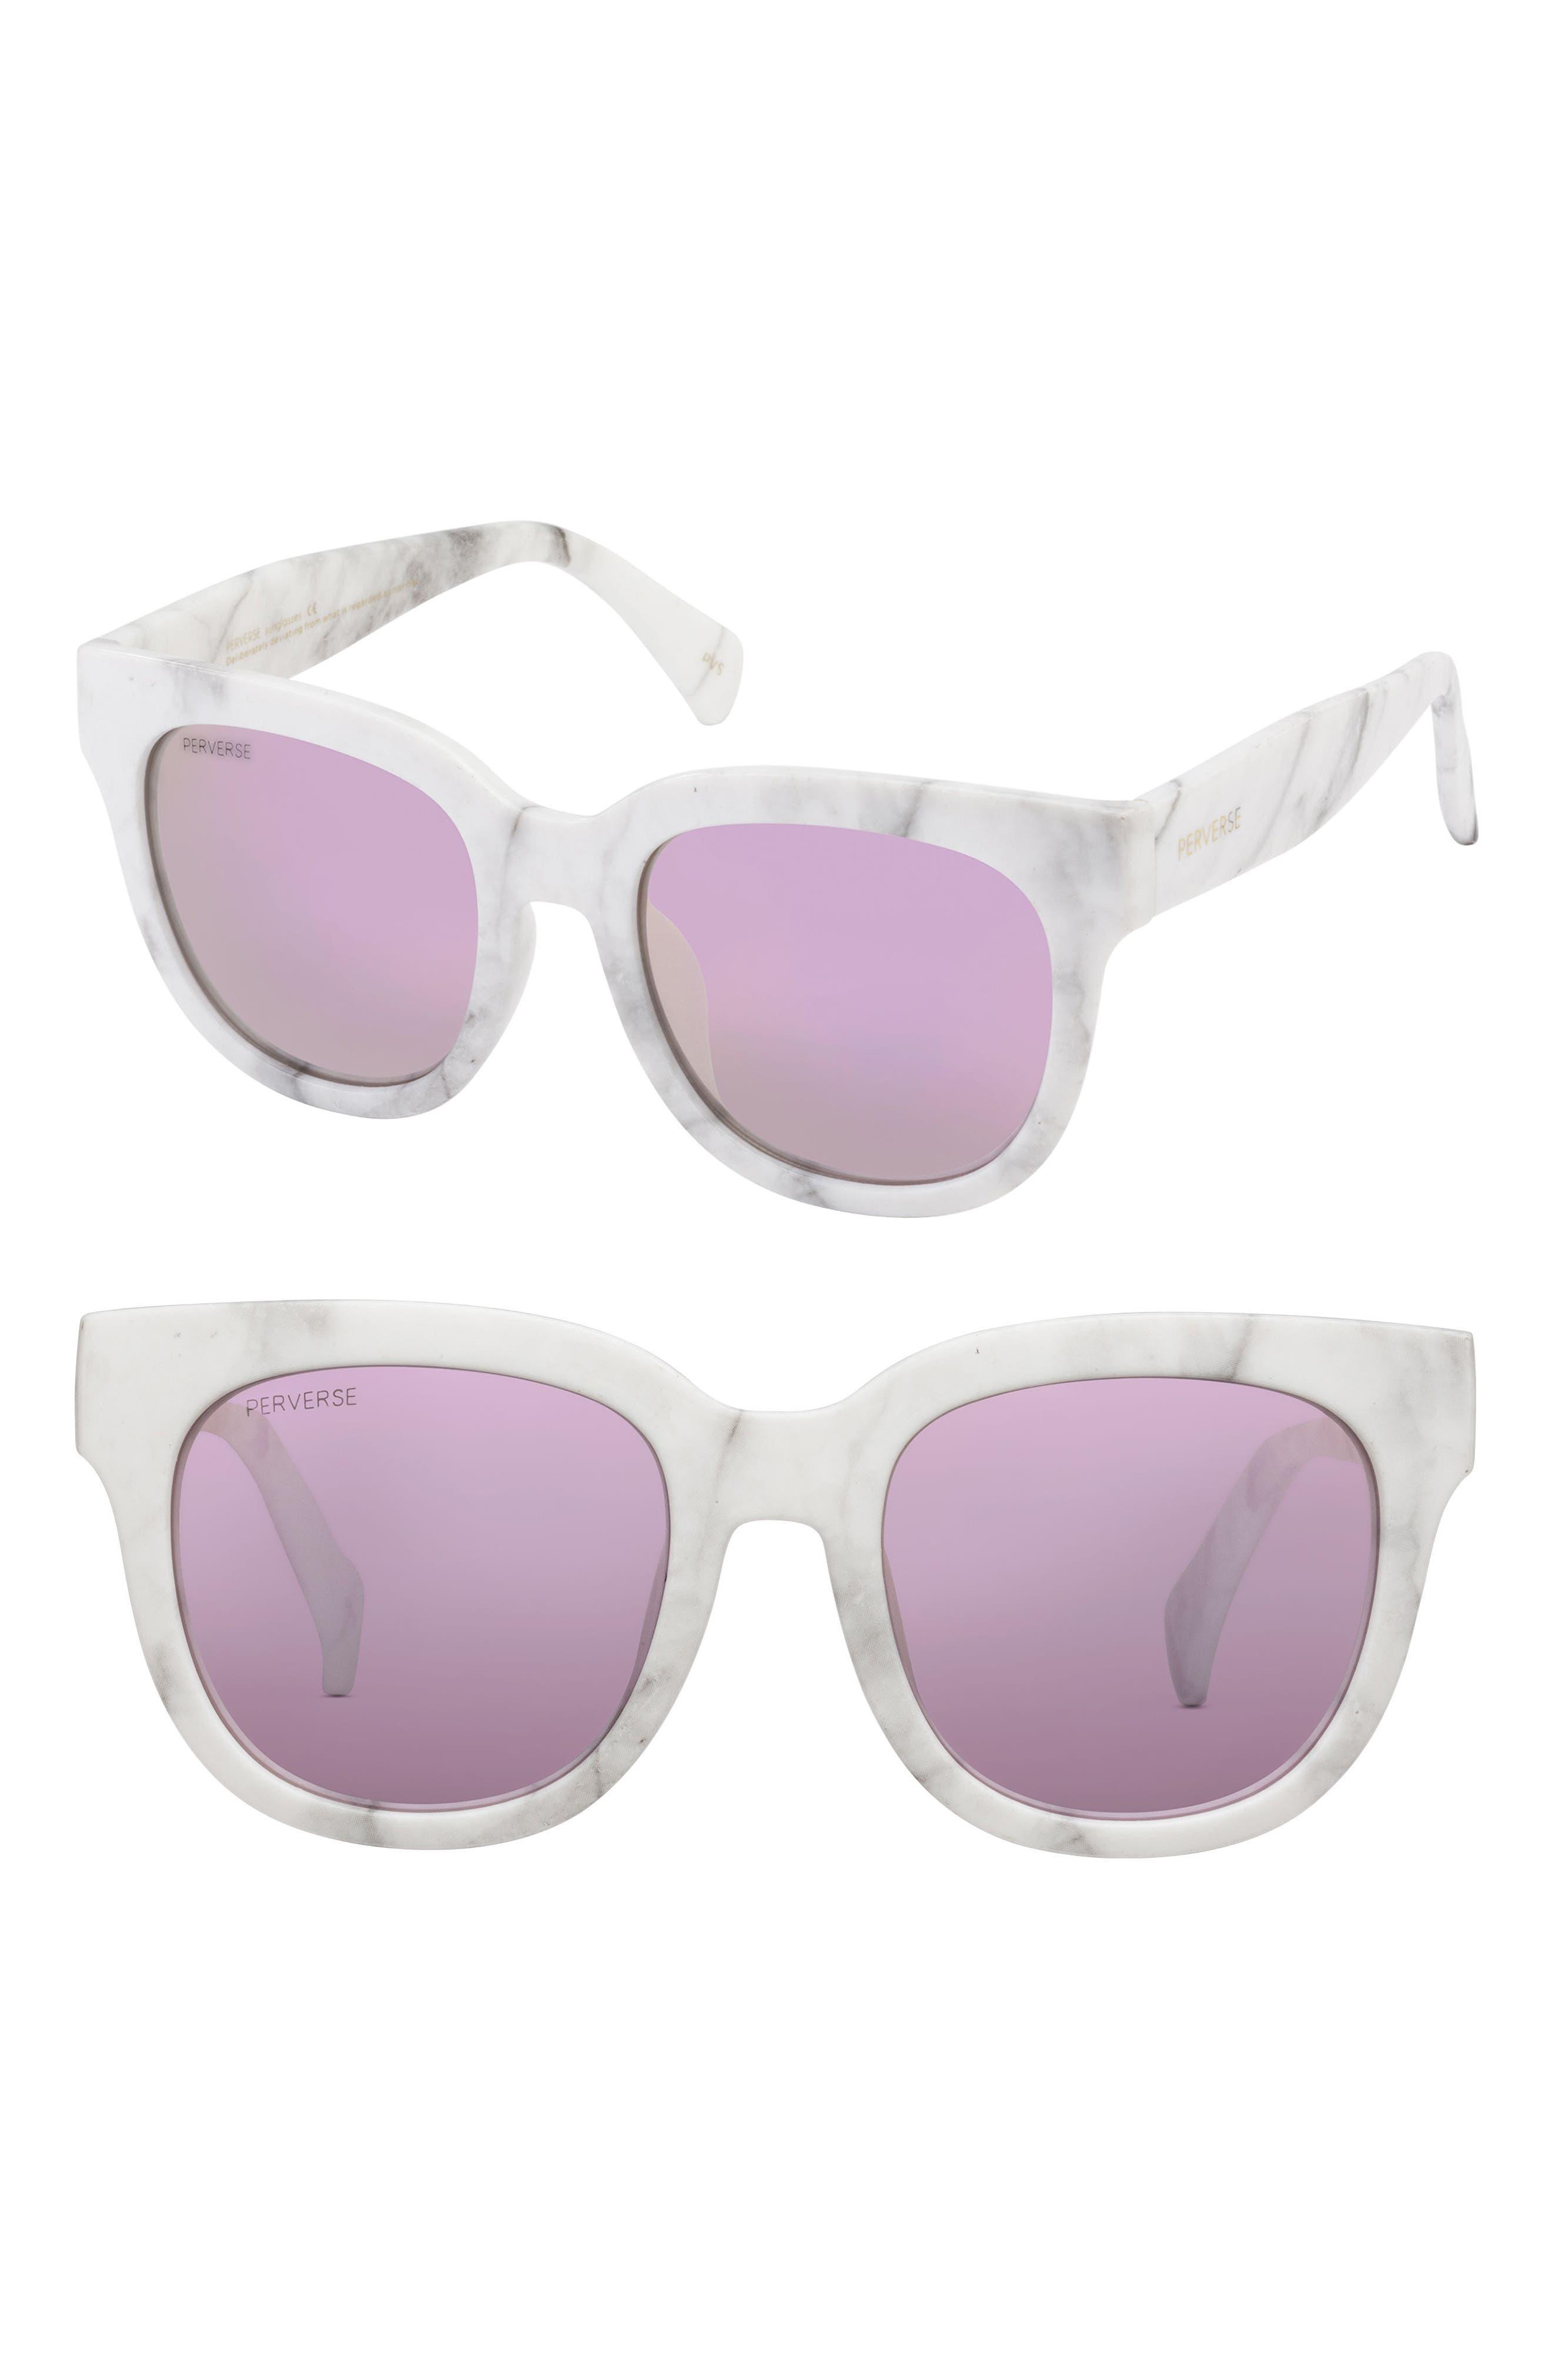 Main Image - PERVERSE Roman 50mm Mirrored Sunglasses